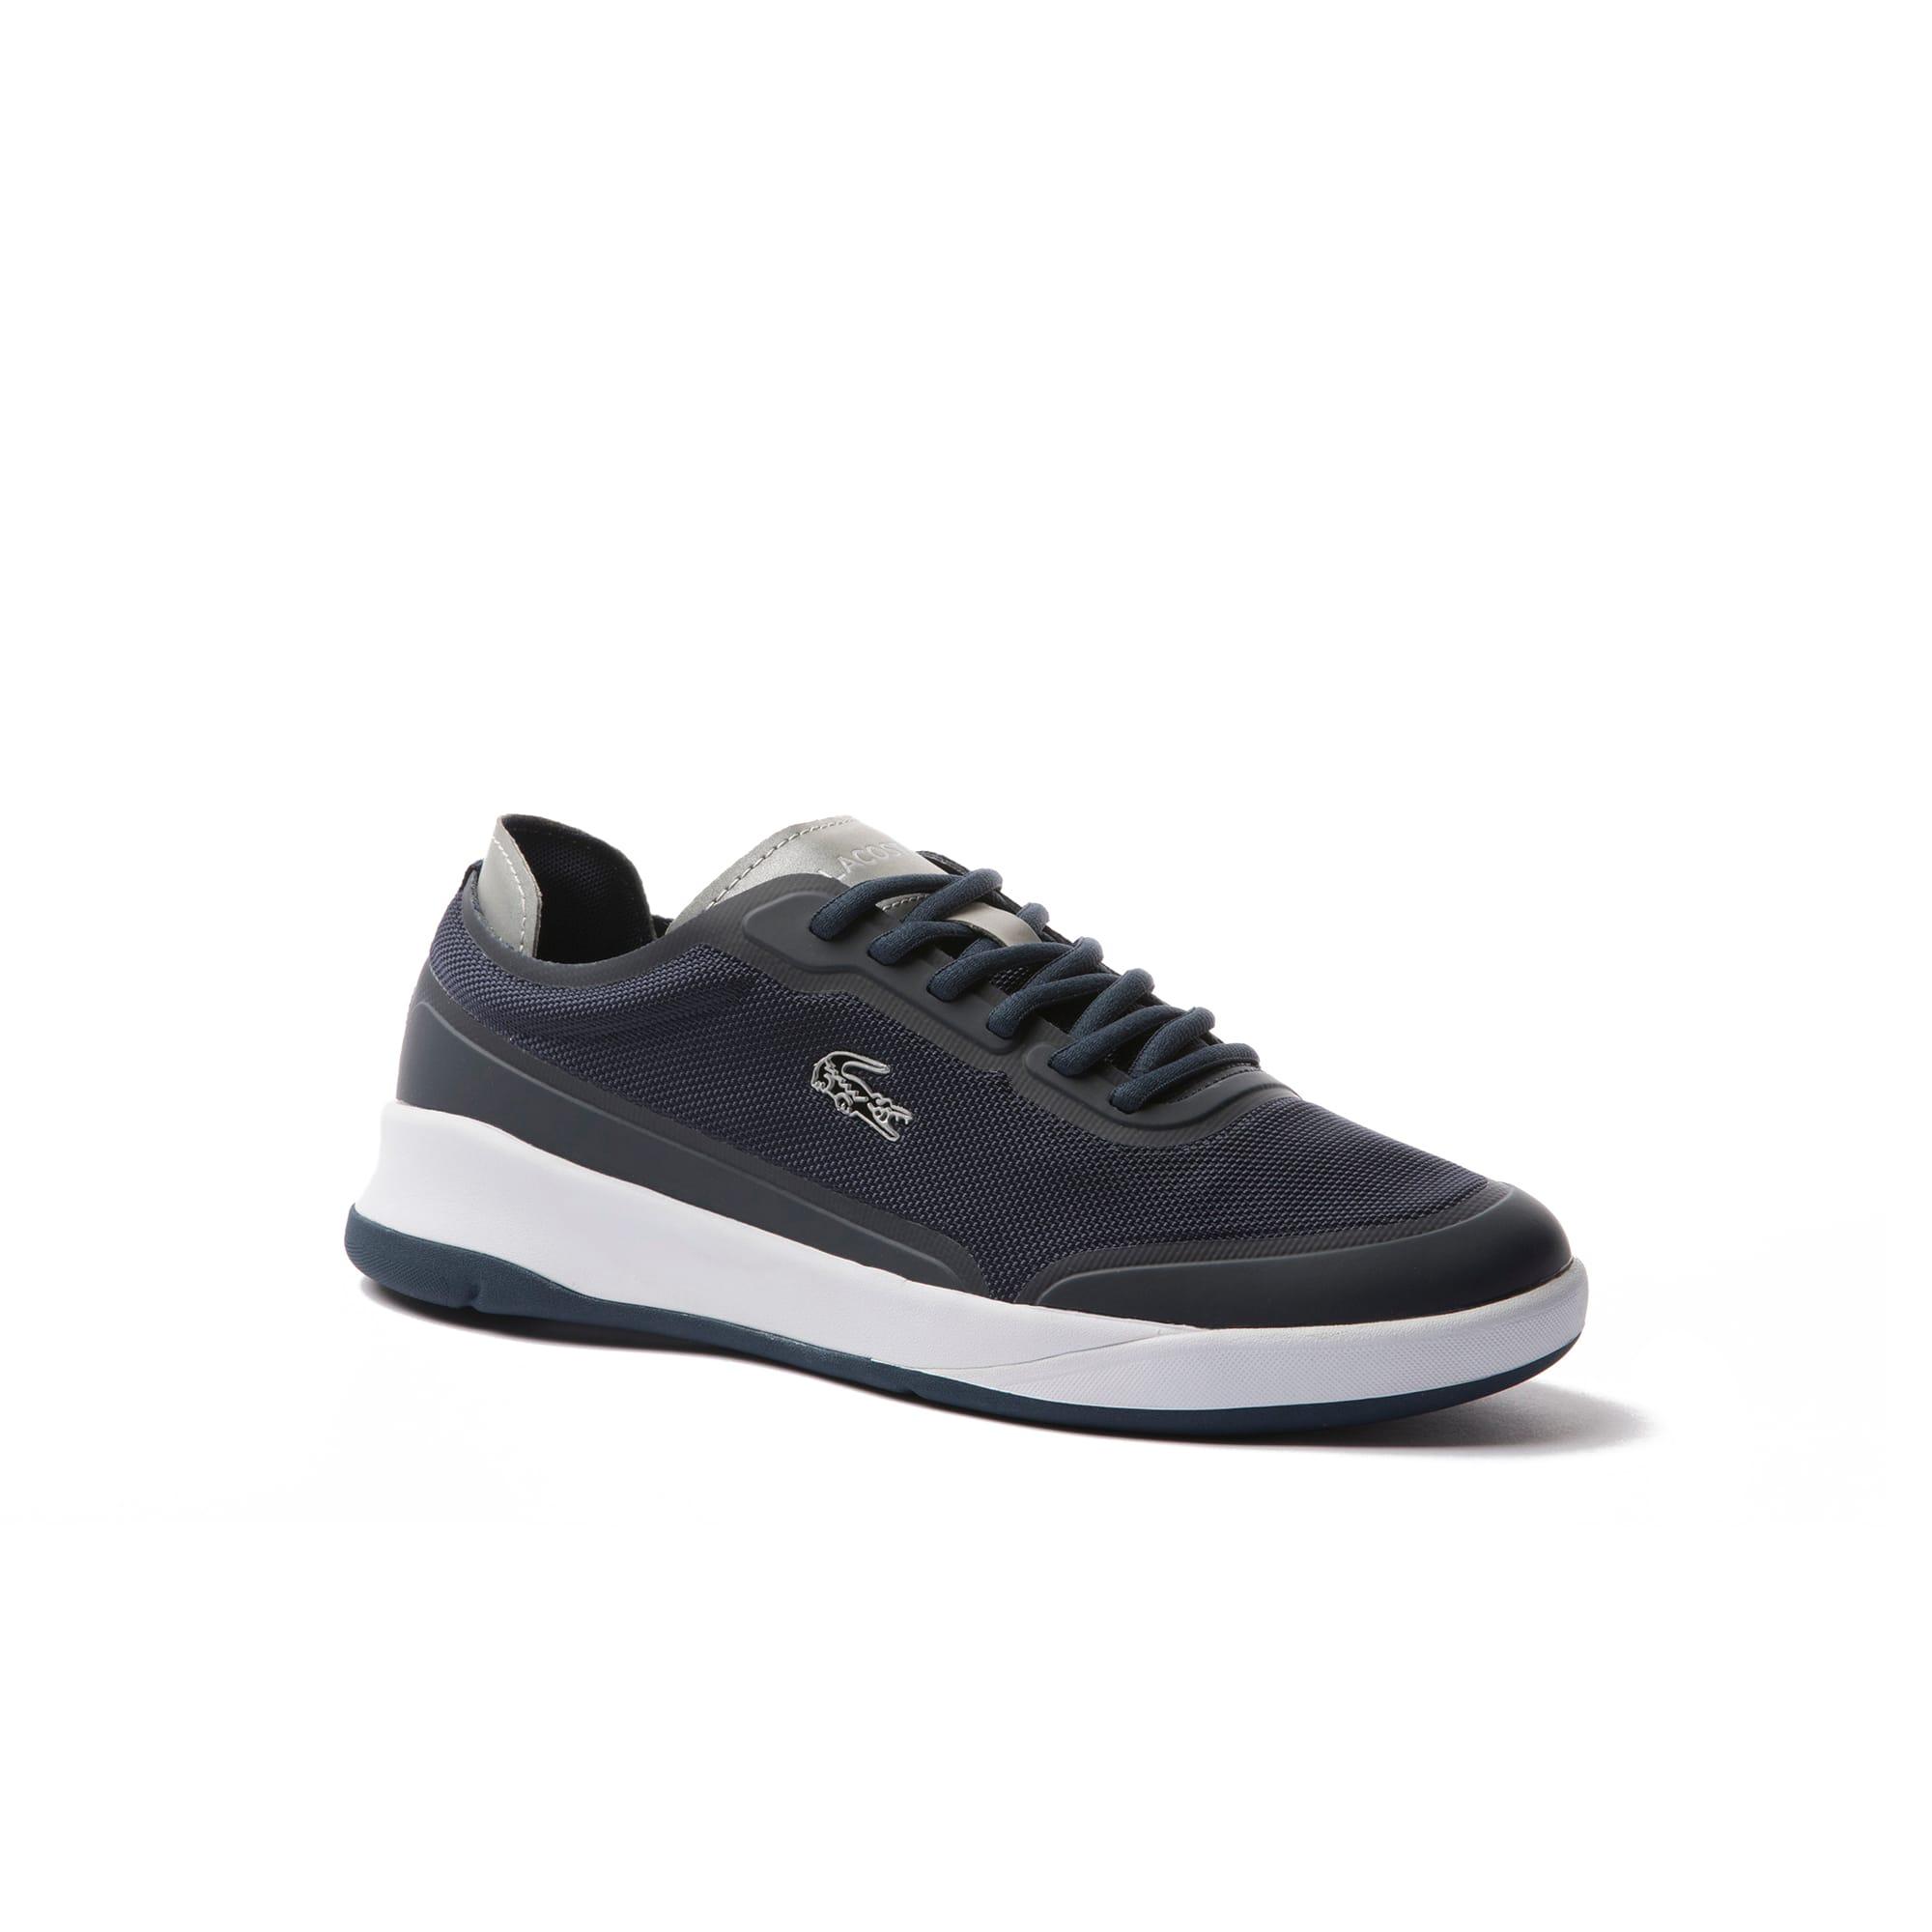 Men's LT Spirit Elite Textile Sneakers